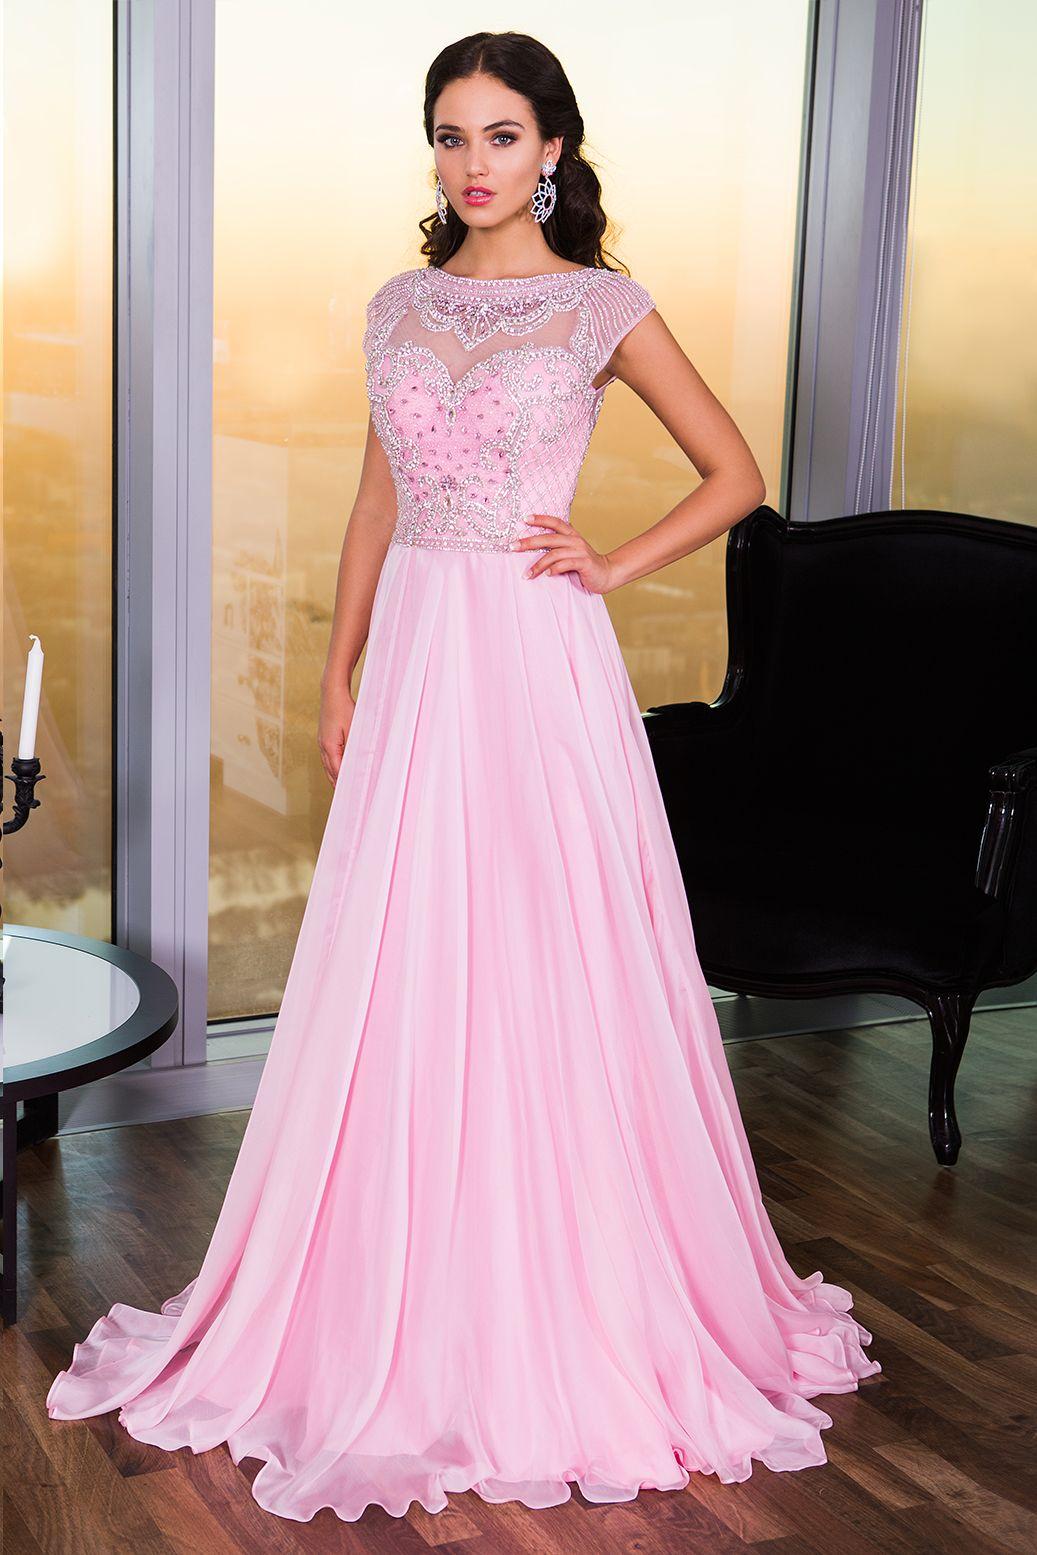 Pink Cap Sleeve Dress 21030 Prom Dresses Light pink